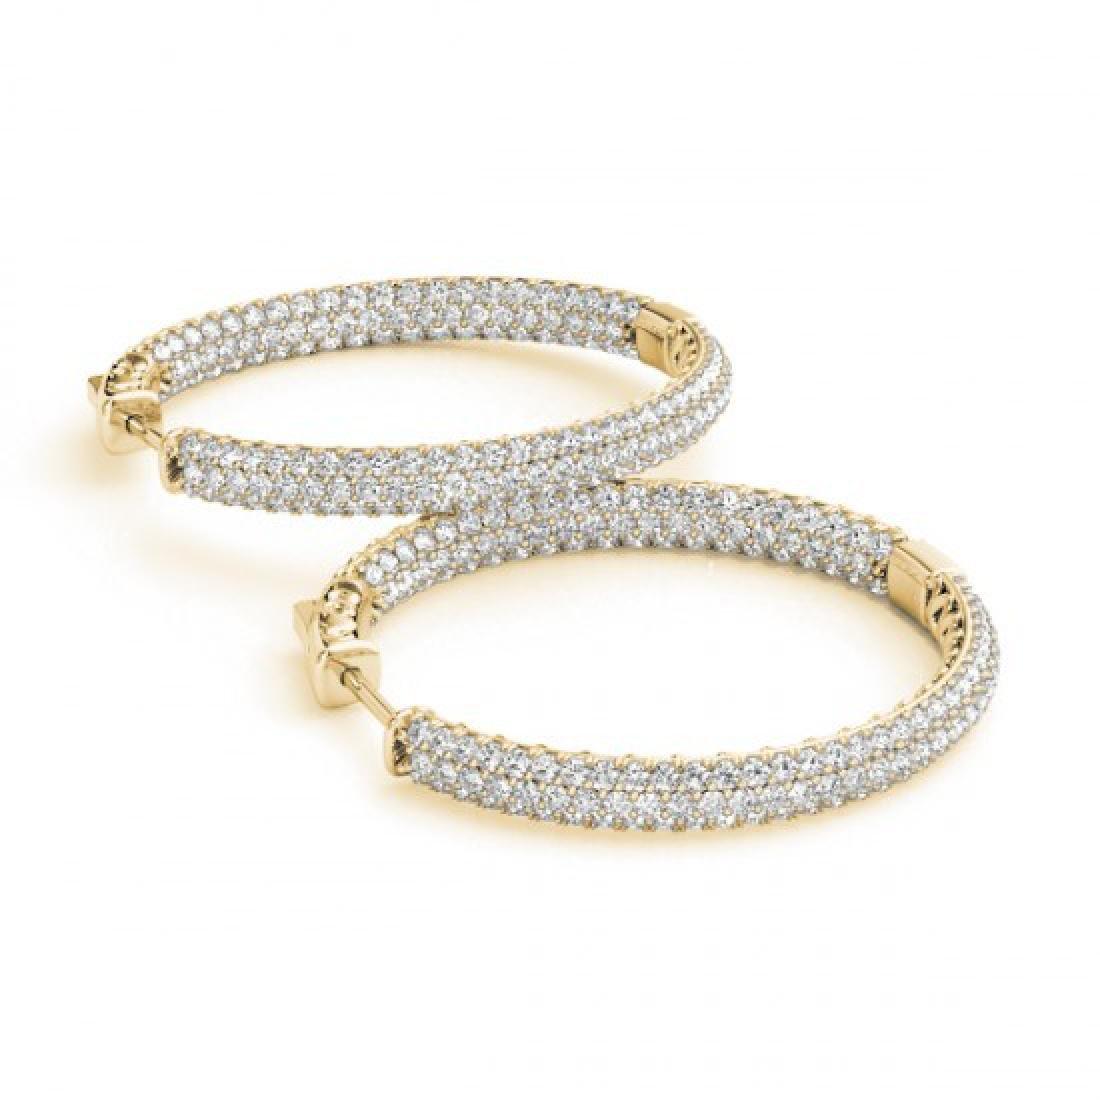 4.5 CTW Diamond VS/SI Certified 36 Mm Hoop Earrings 14K